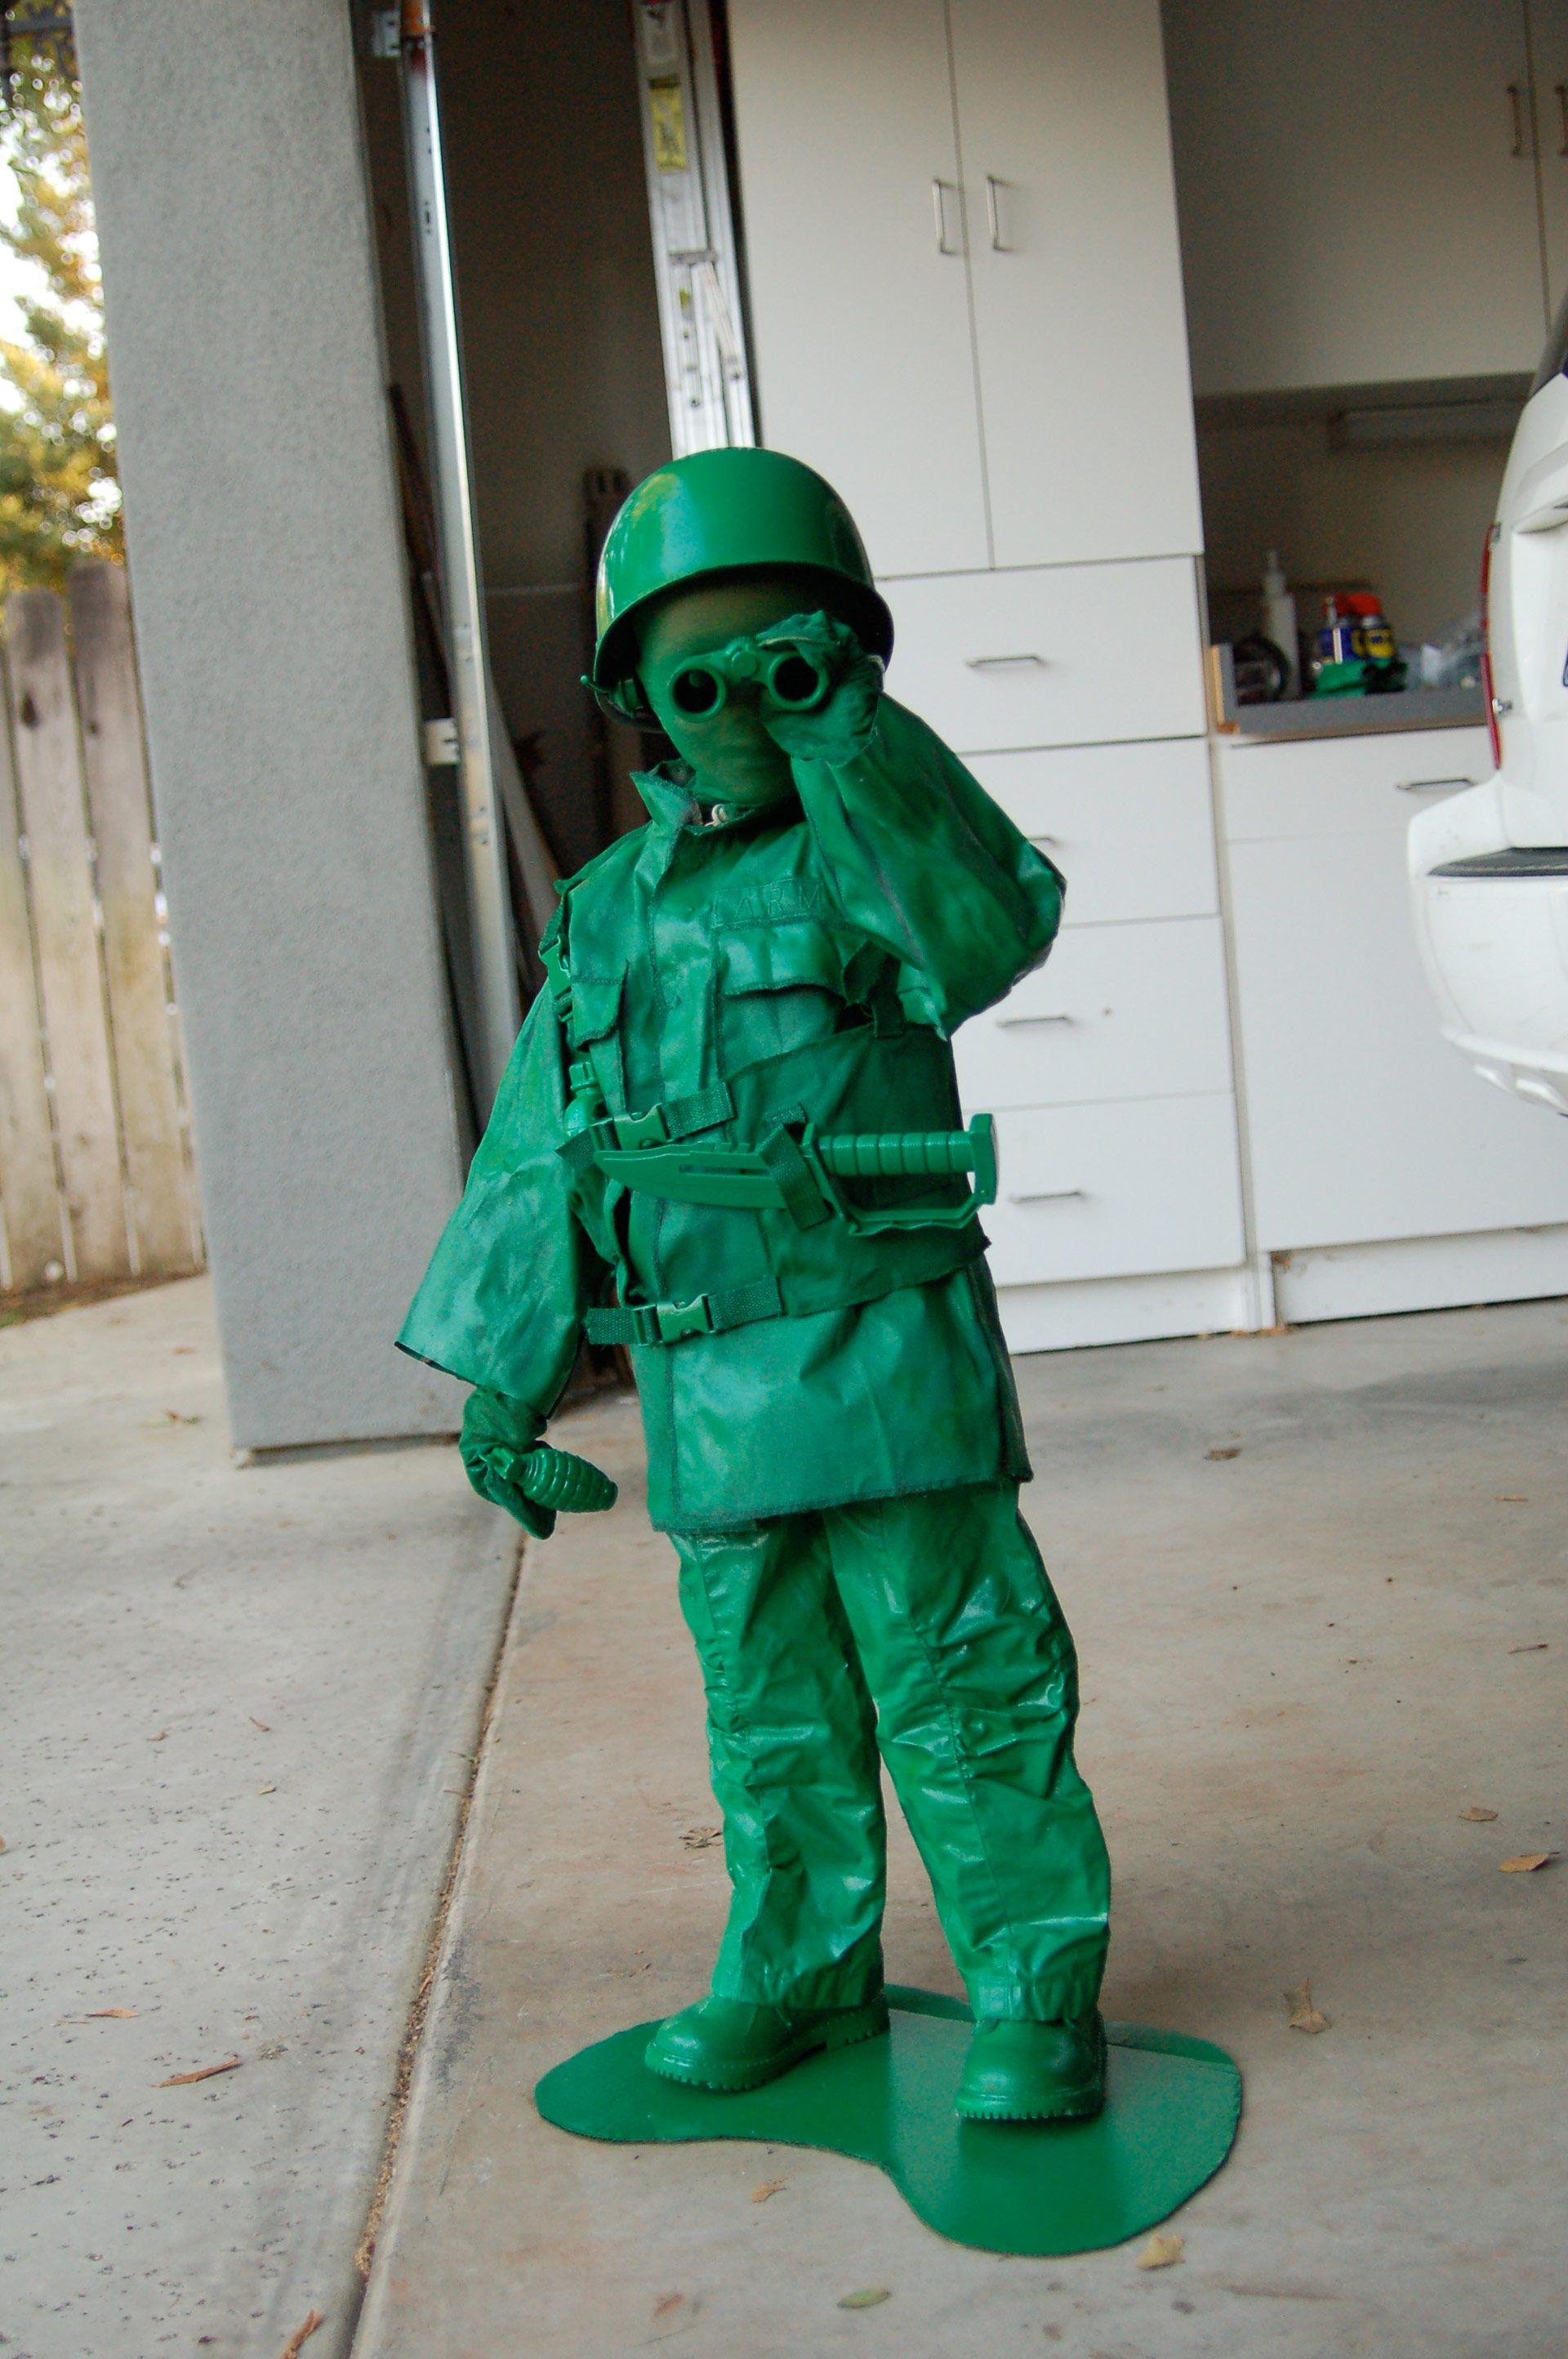 62 Utterly Adorable Homemade Halloween Costumes for Kids